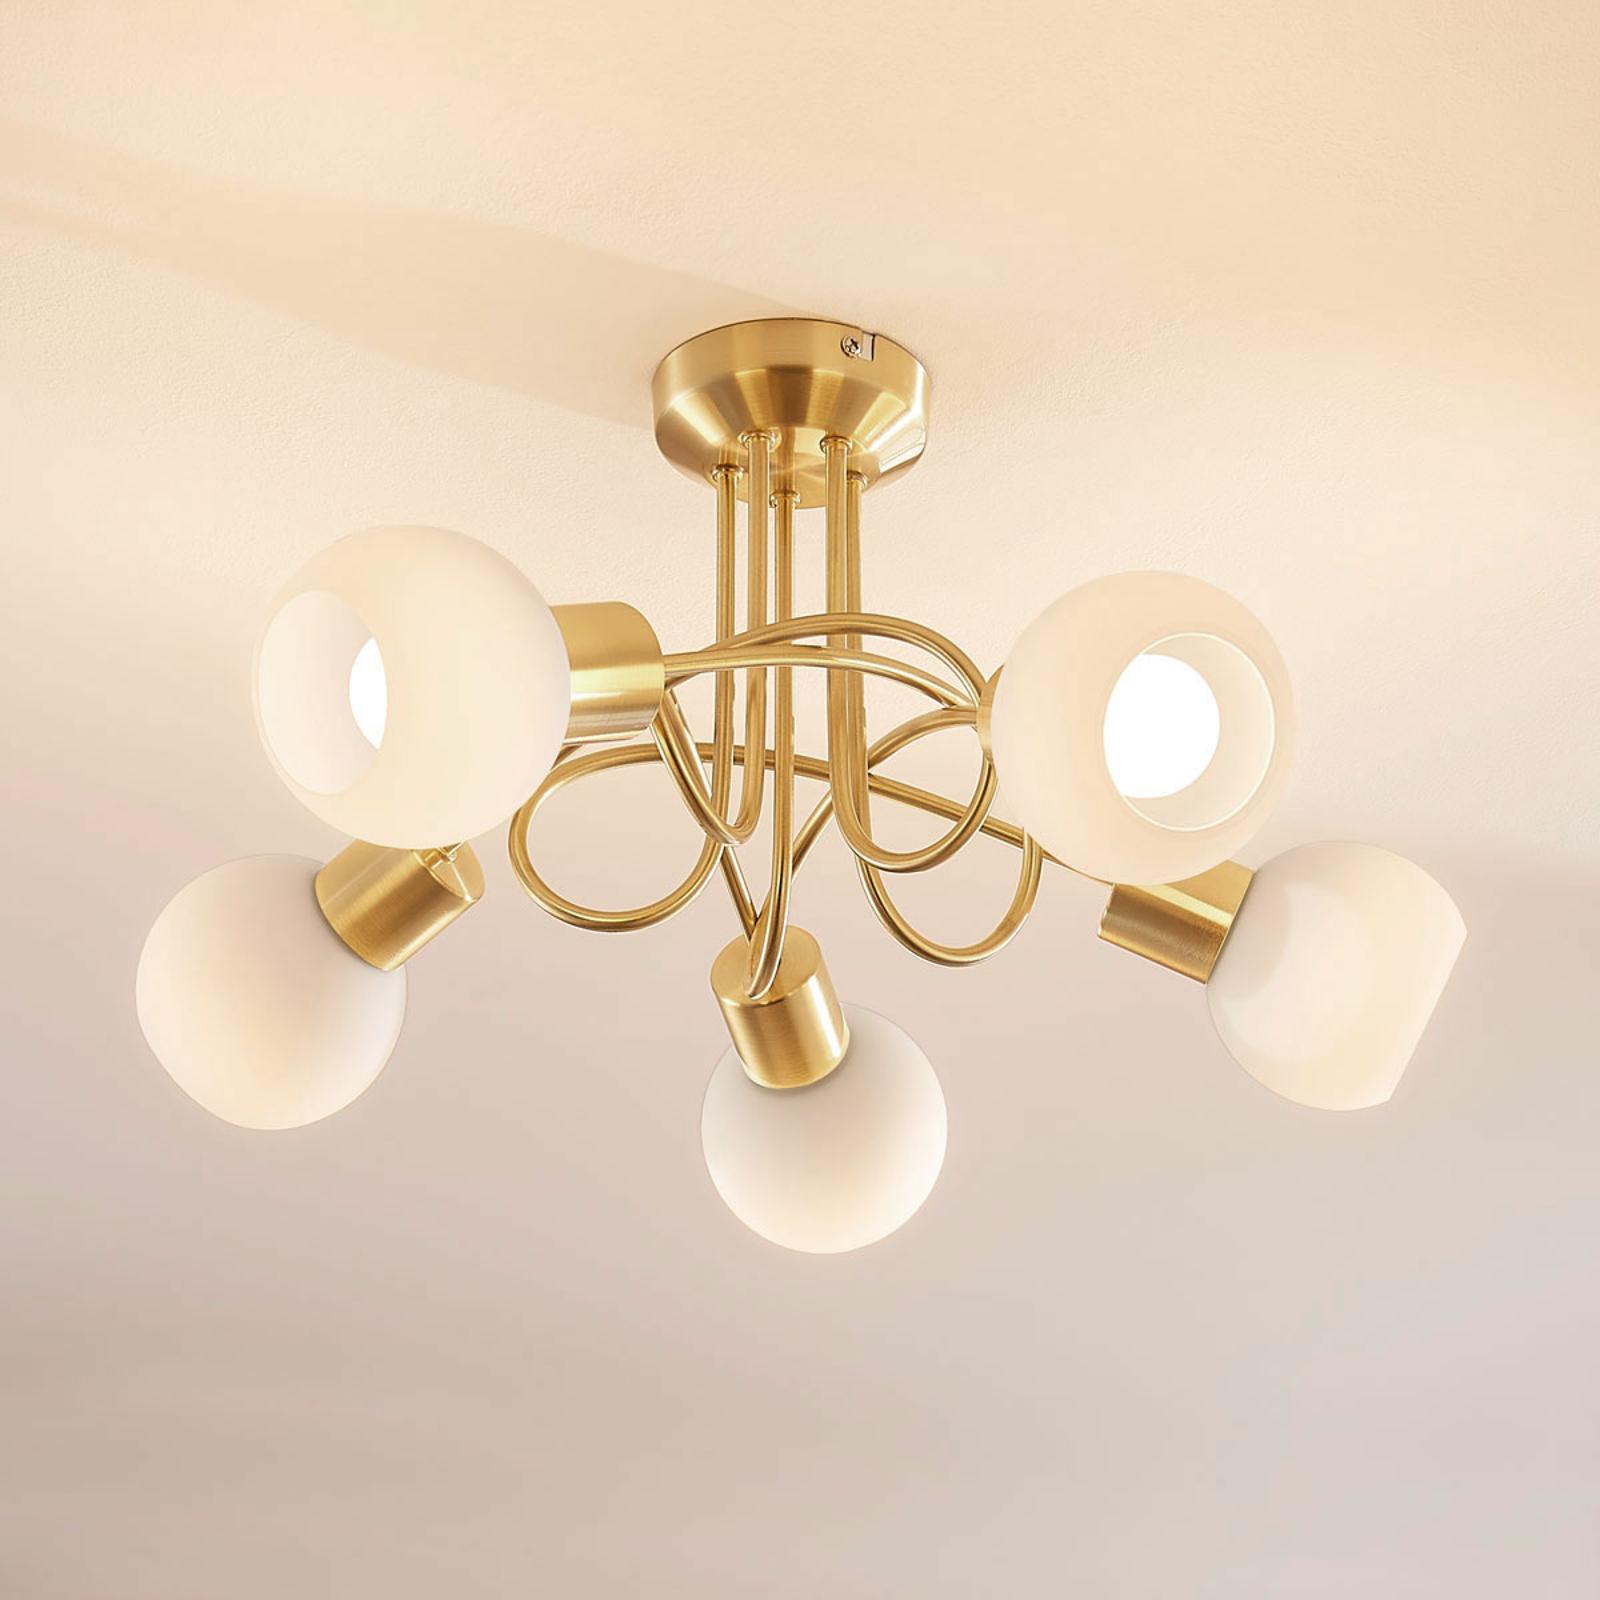 Lampa sufitowa LED ELAINA, mosiężna, 5-pkt.